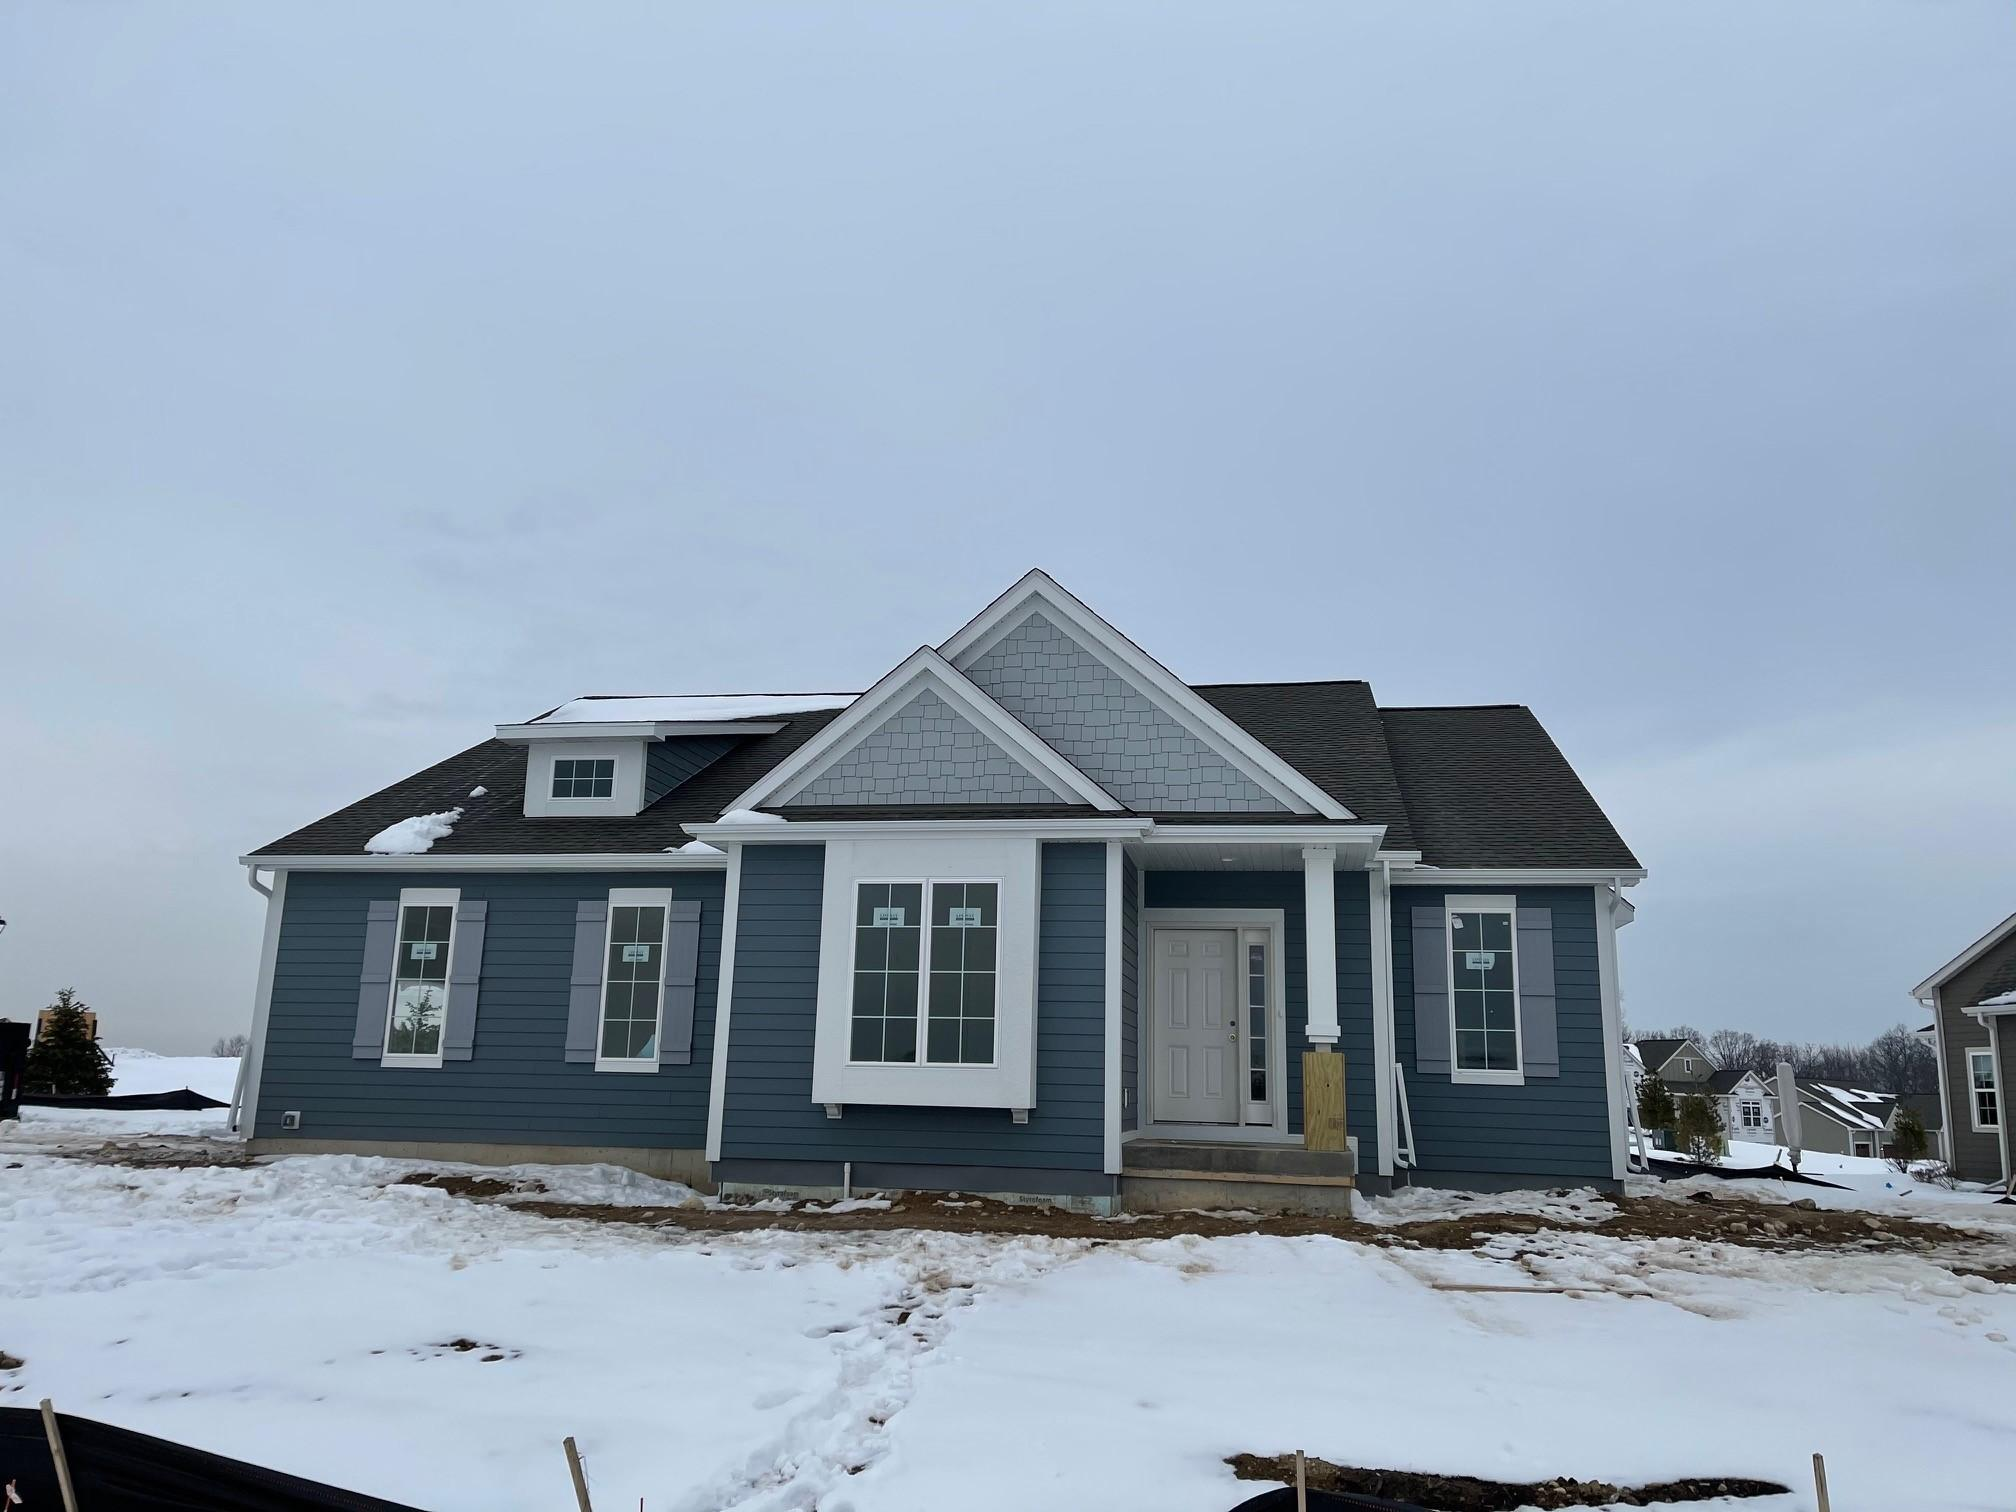 Lt50 Overlook Circle E, Hartland, Wisconsin 53029, 2 Bedrooms Bedrooms, ,2 BathroomsBathrooms,Condominiums,For Sale,Overlook Circle E,1,1723823